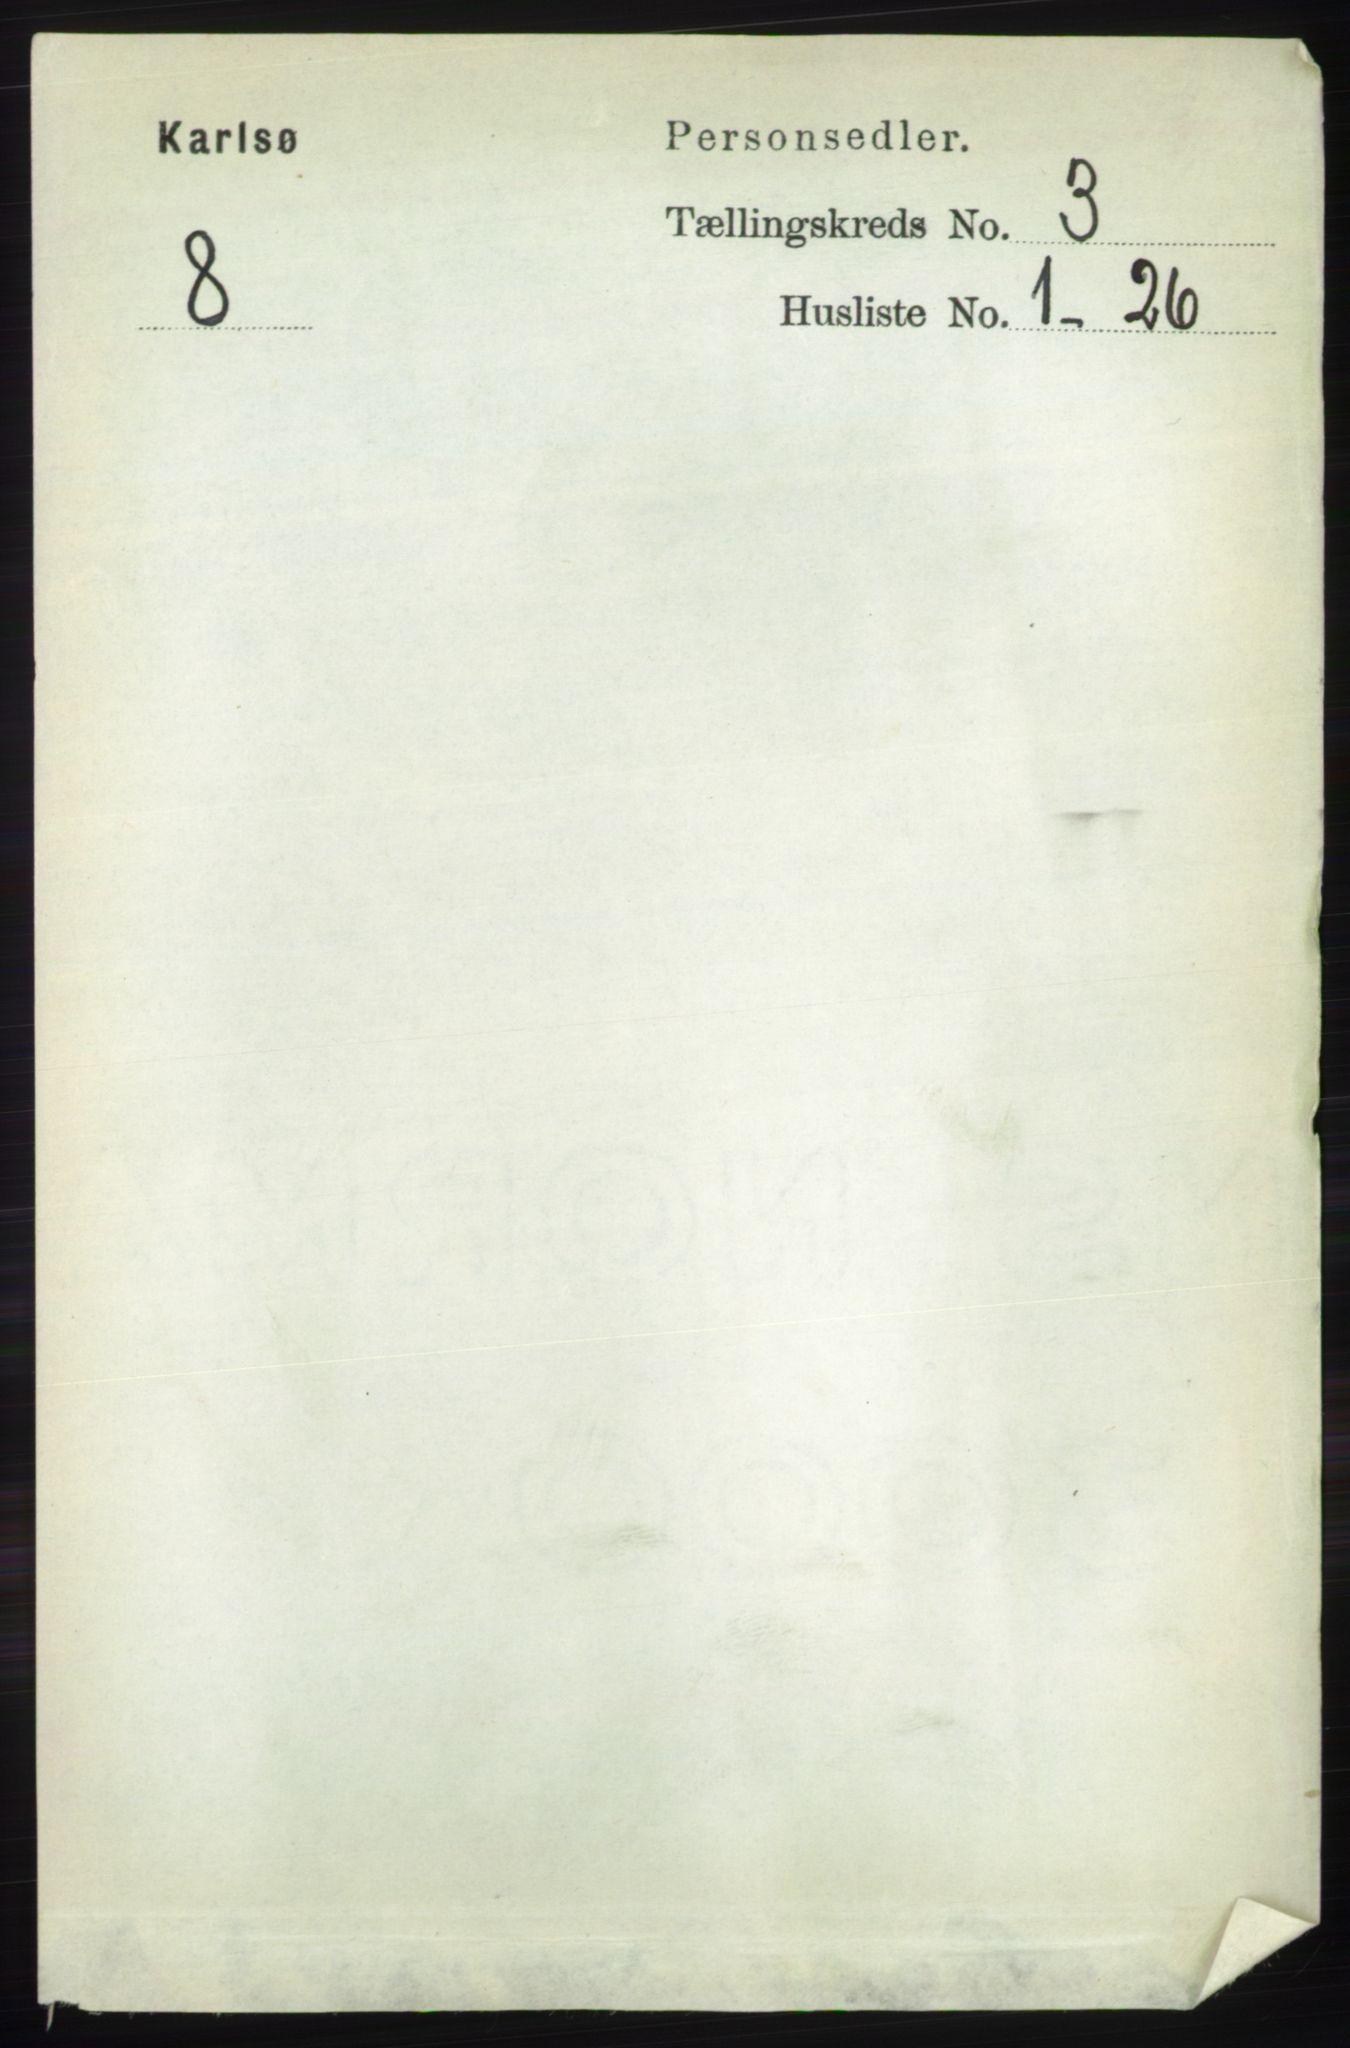 RA, Folketelling 1891 for 1936 Karlsøy herred, 1891, s. 606